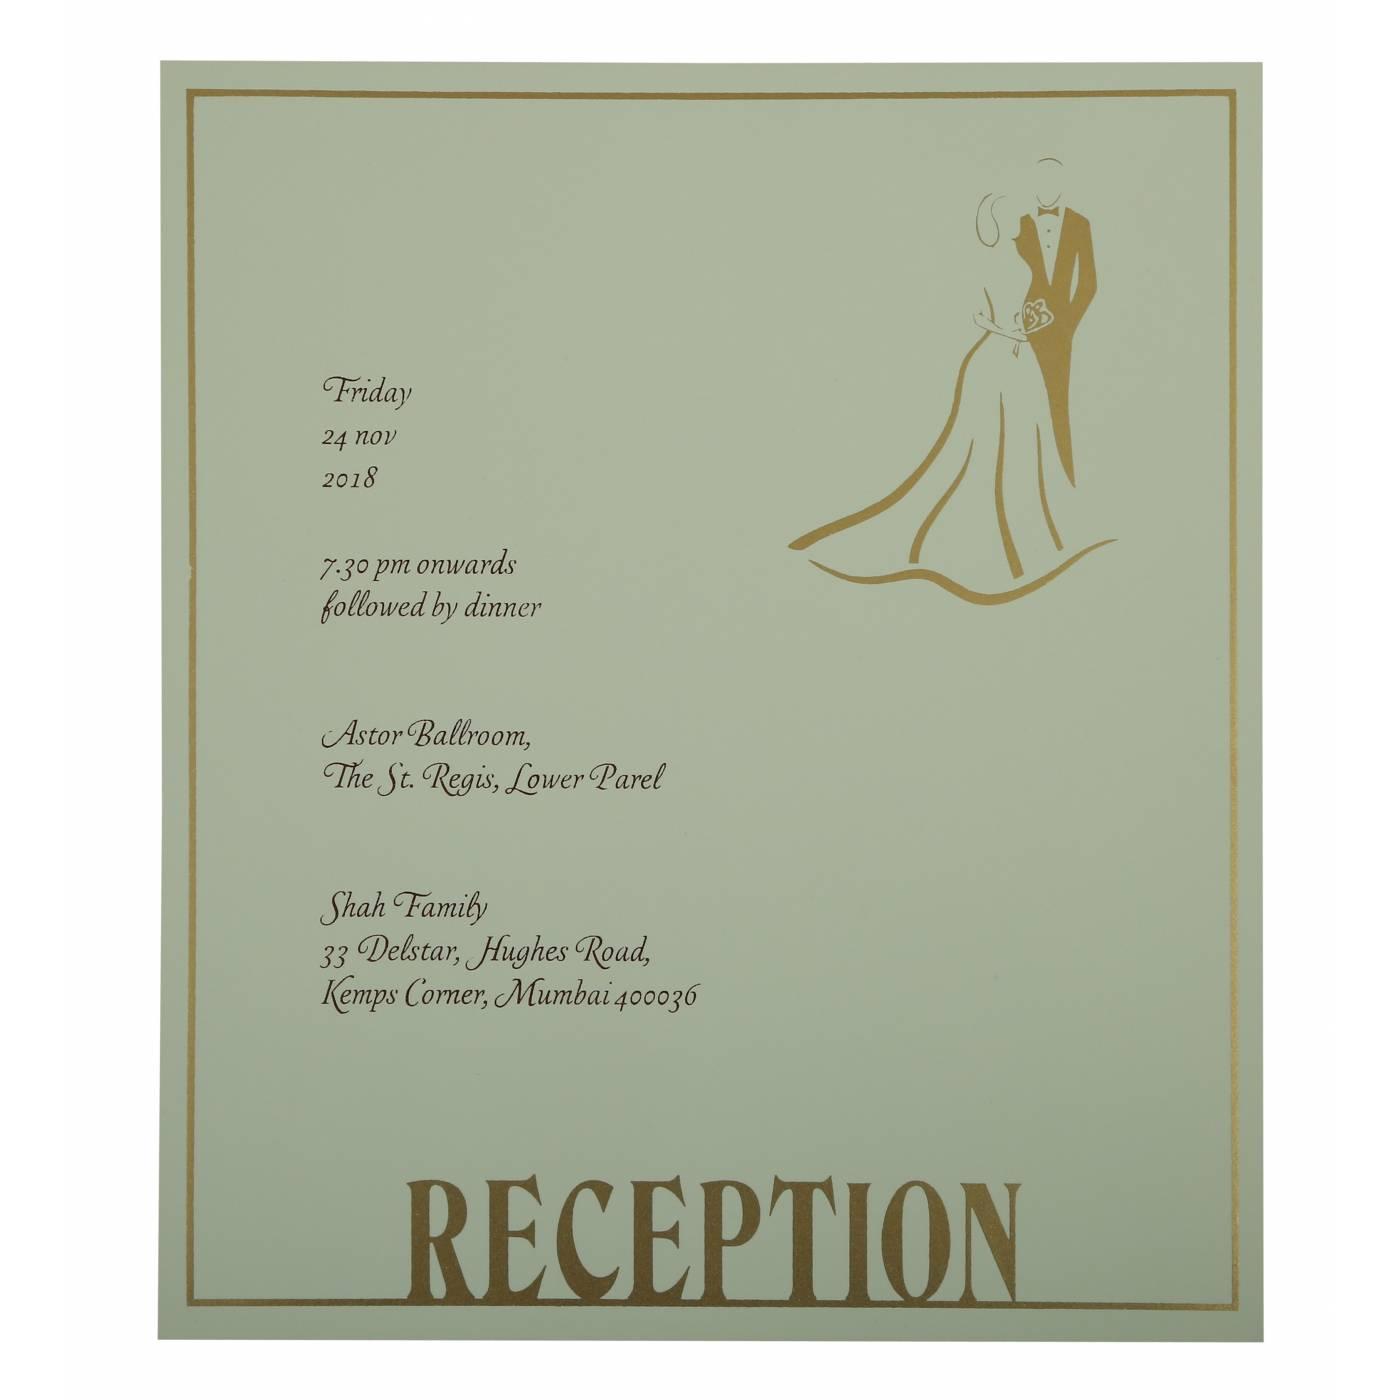 OLIVE GREEN MATTE FOIL STAMPED WEDDING INVITATION : CW-1804 - IndianWeddingCards